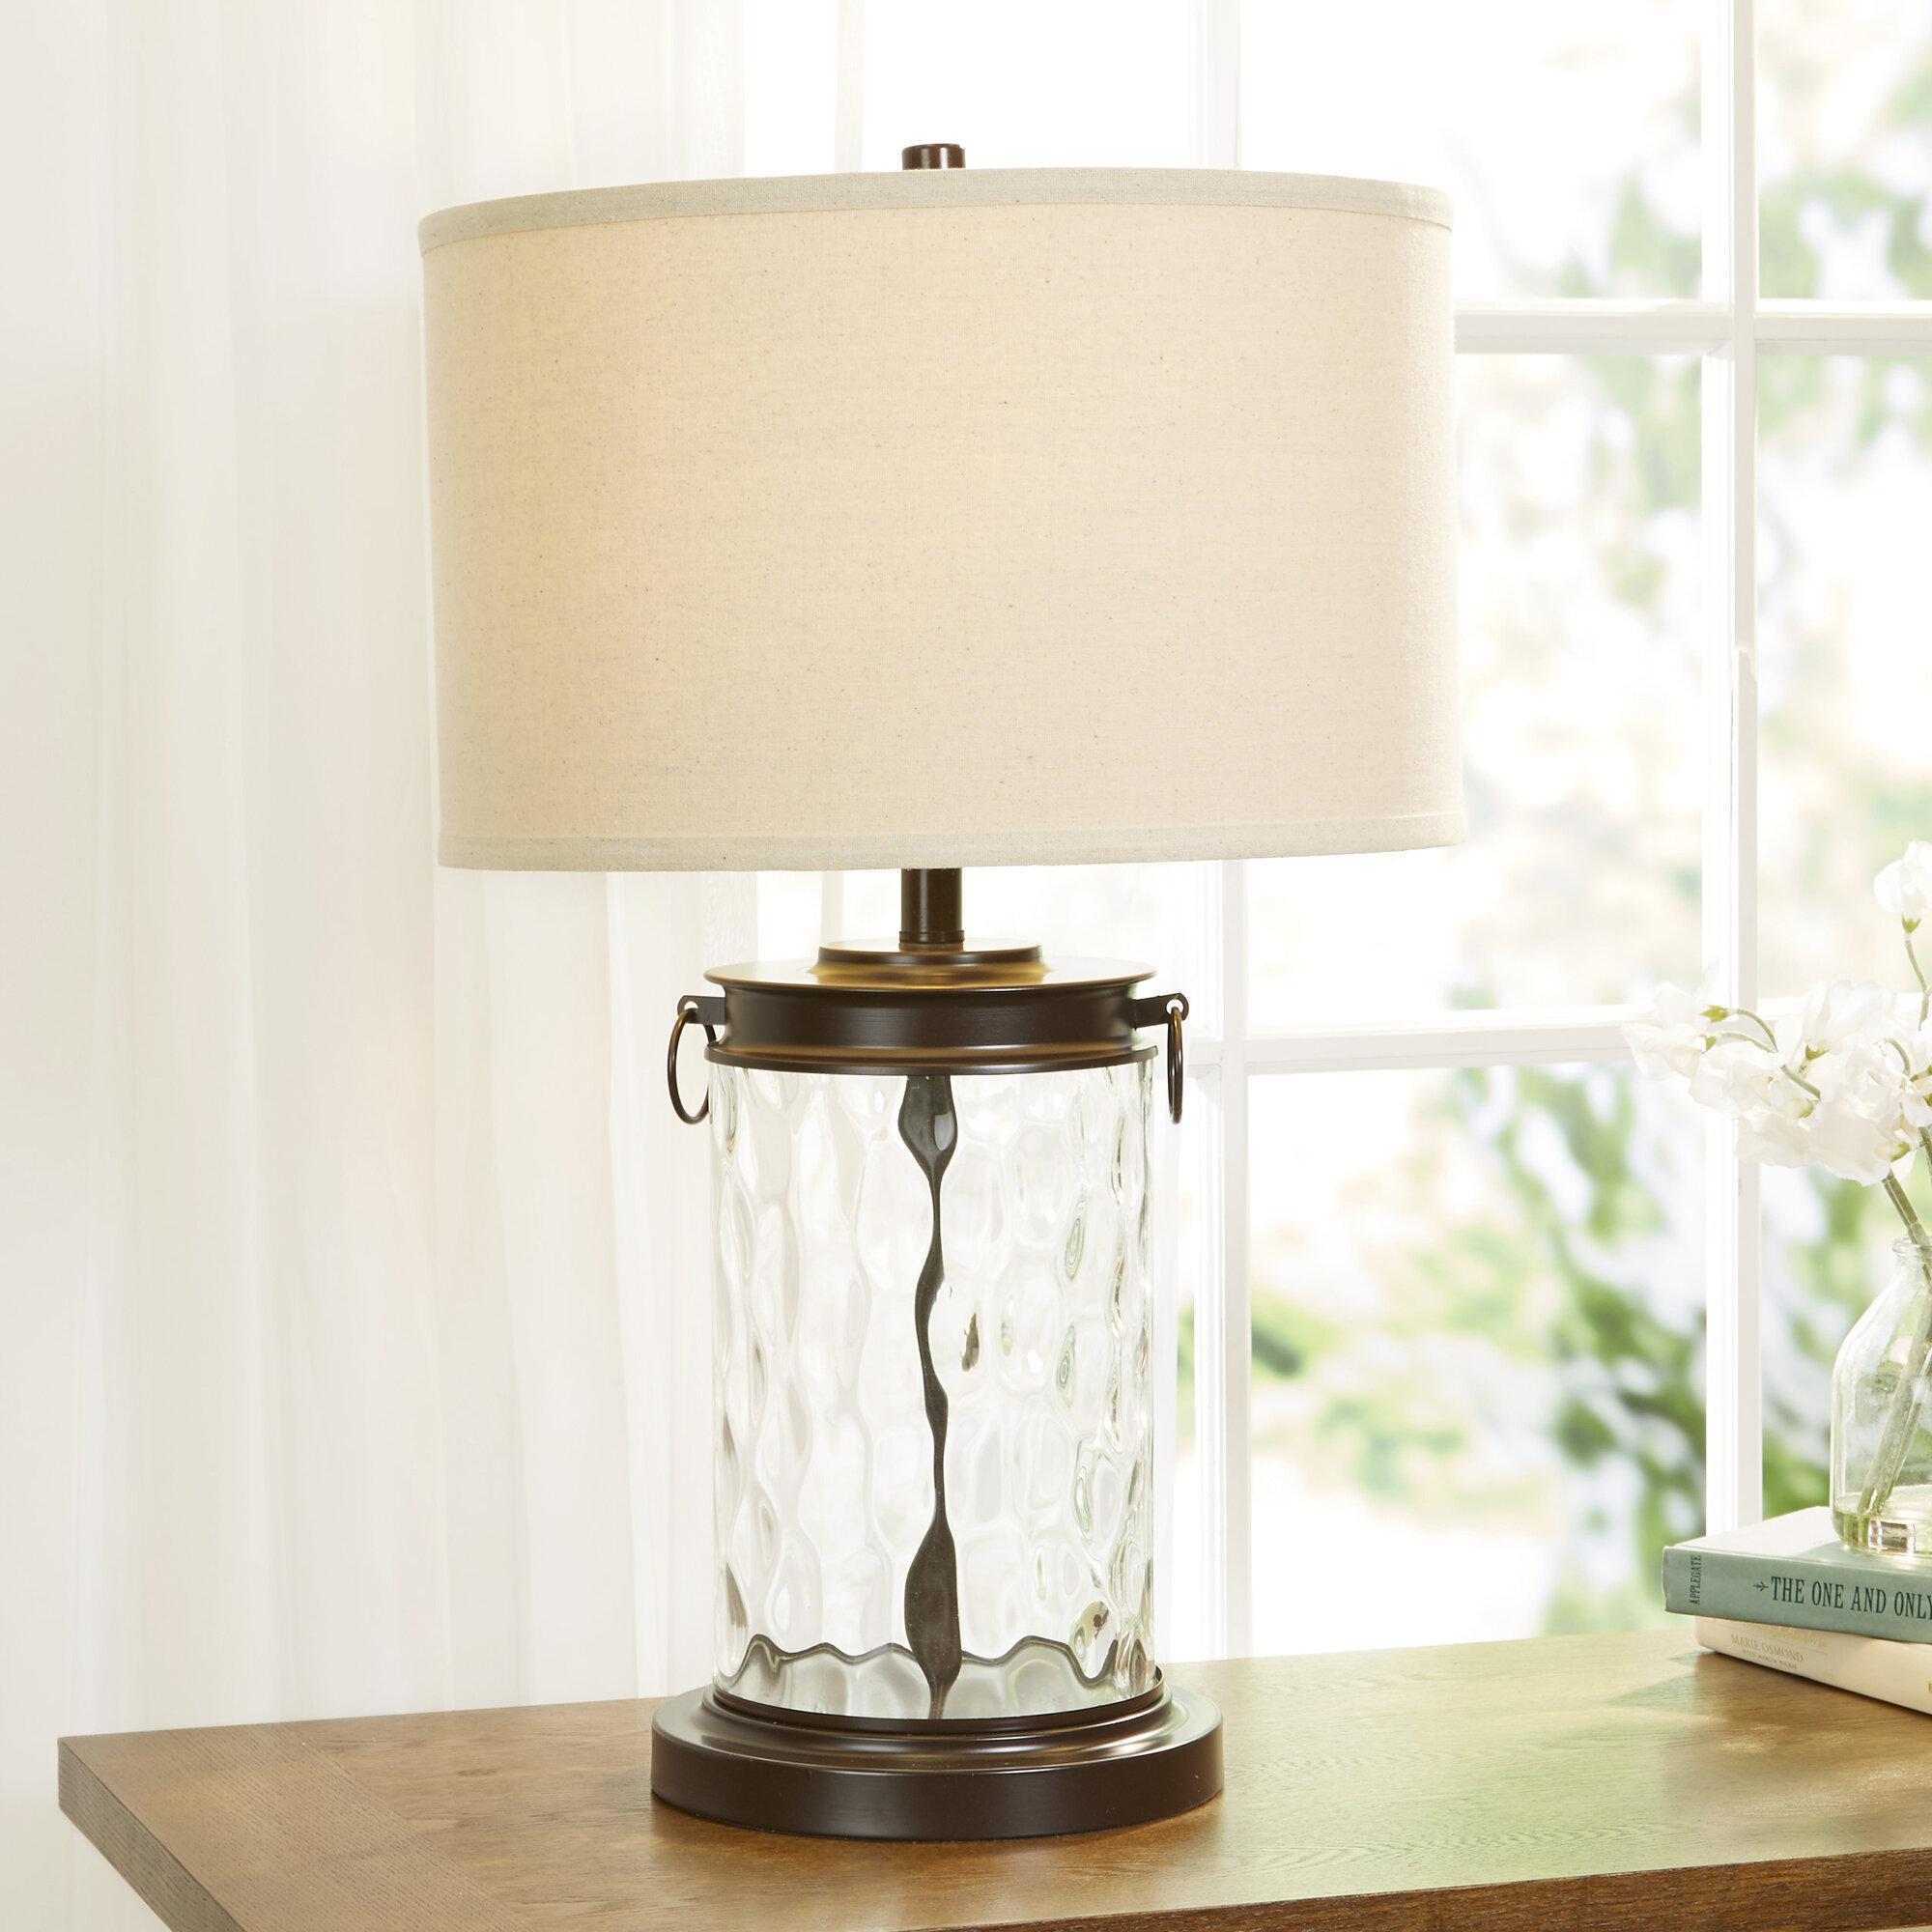 Laurel Wreath Accent Lamp Www Topsimages Com